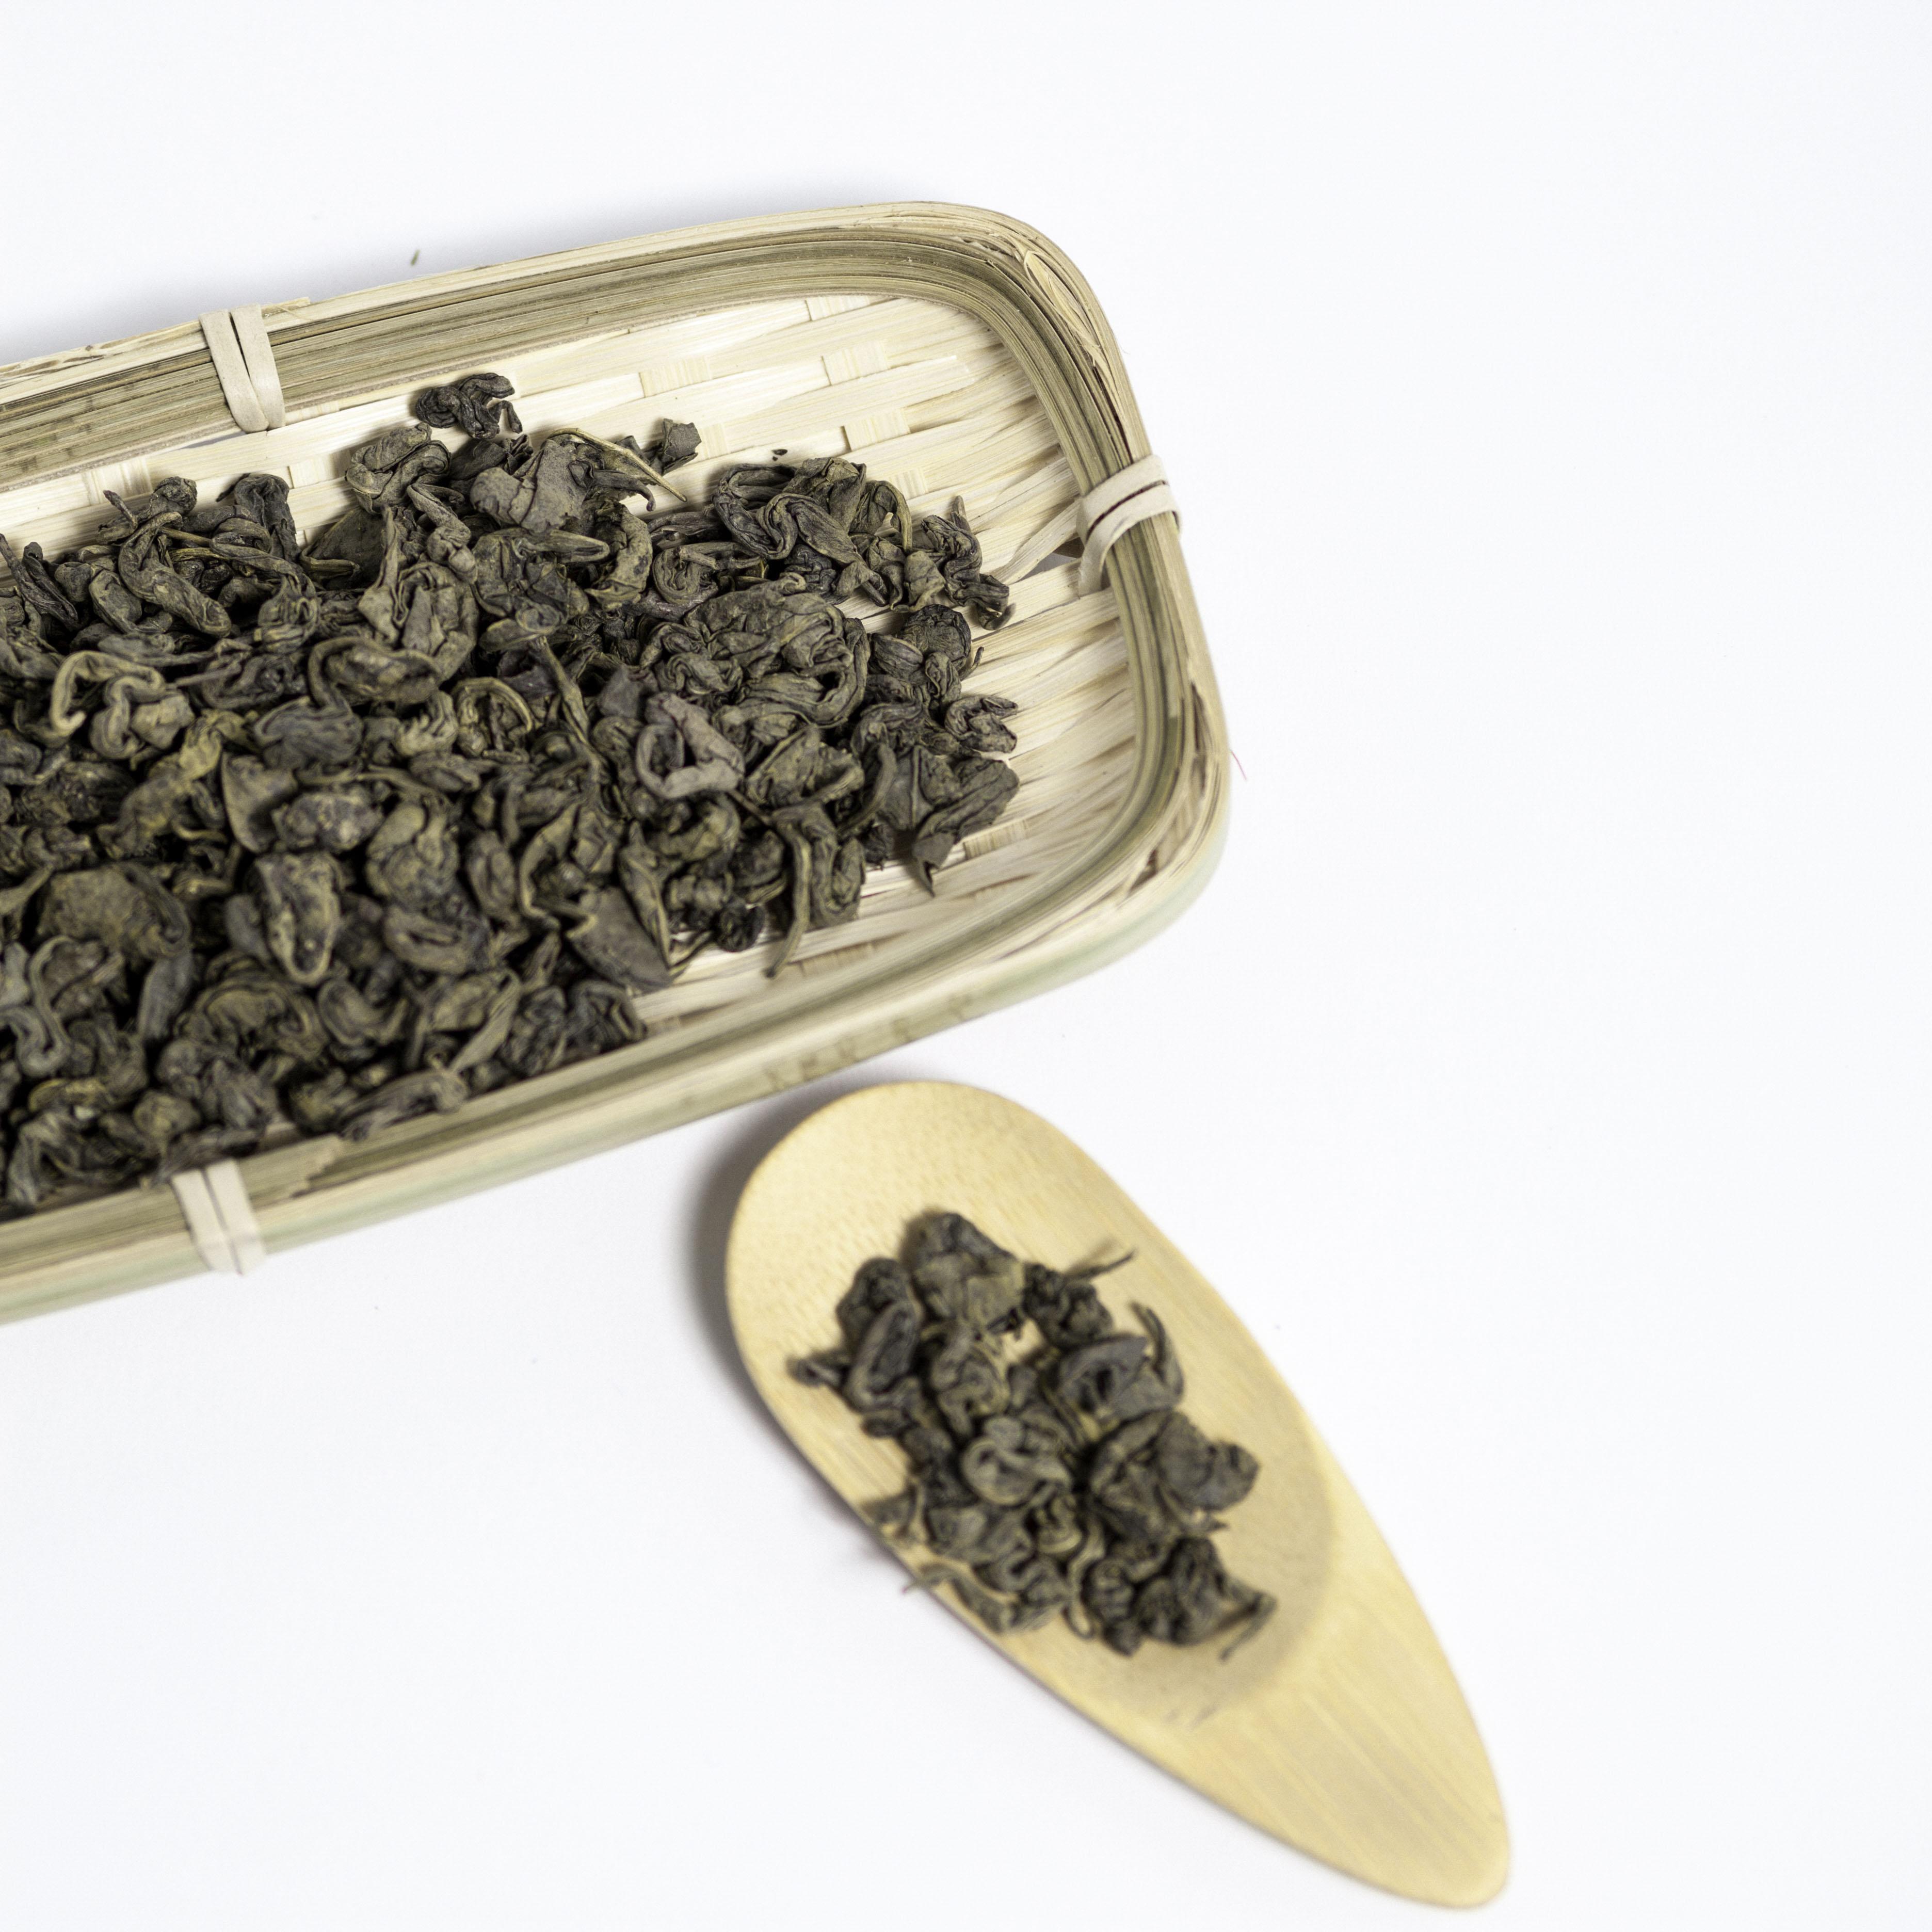 China green tea leaves 9501 from factory - 4uTea | 4uTea.com